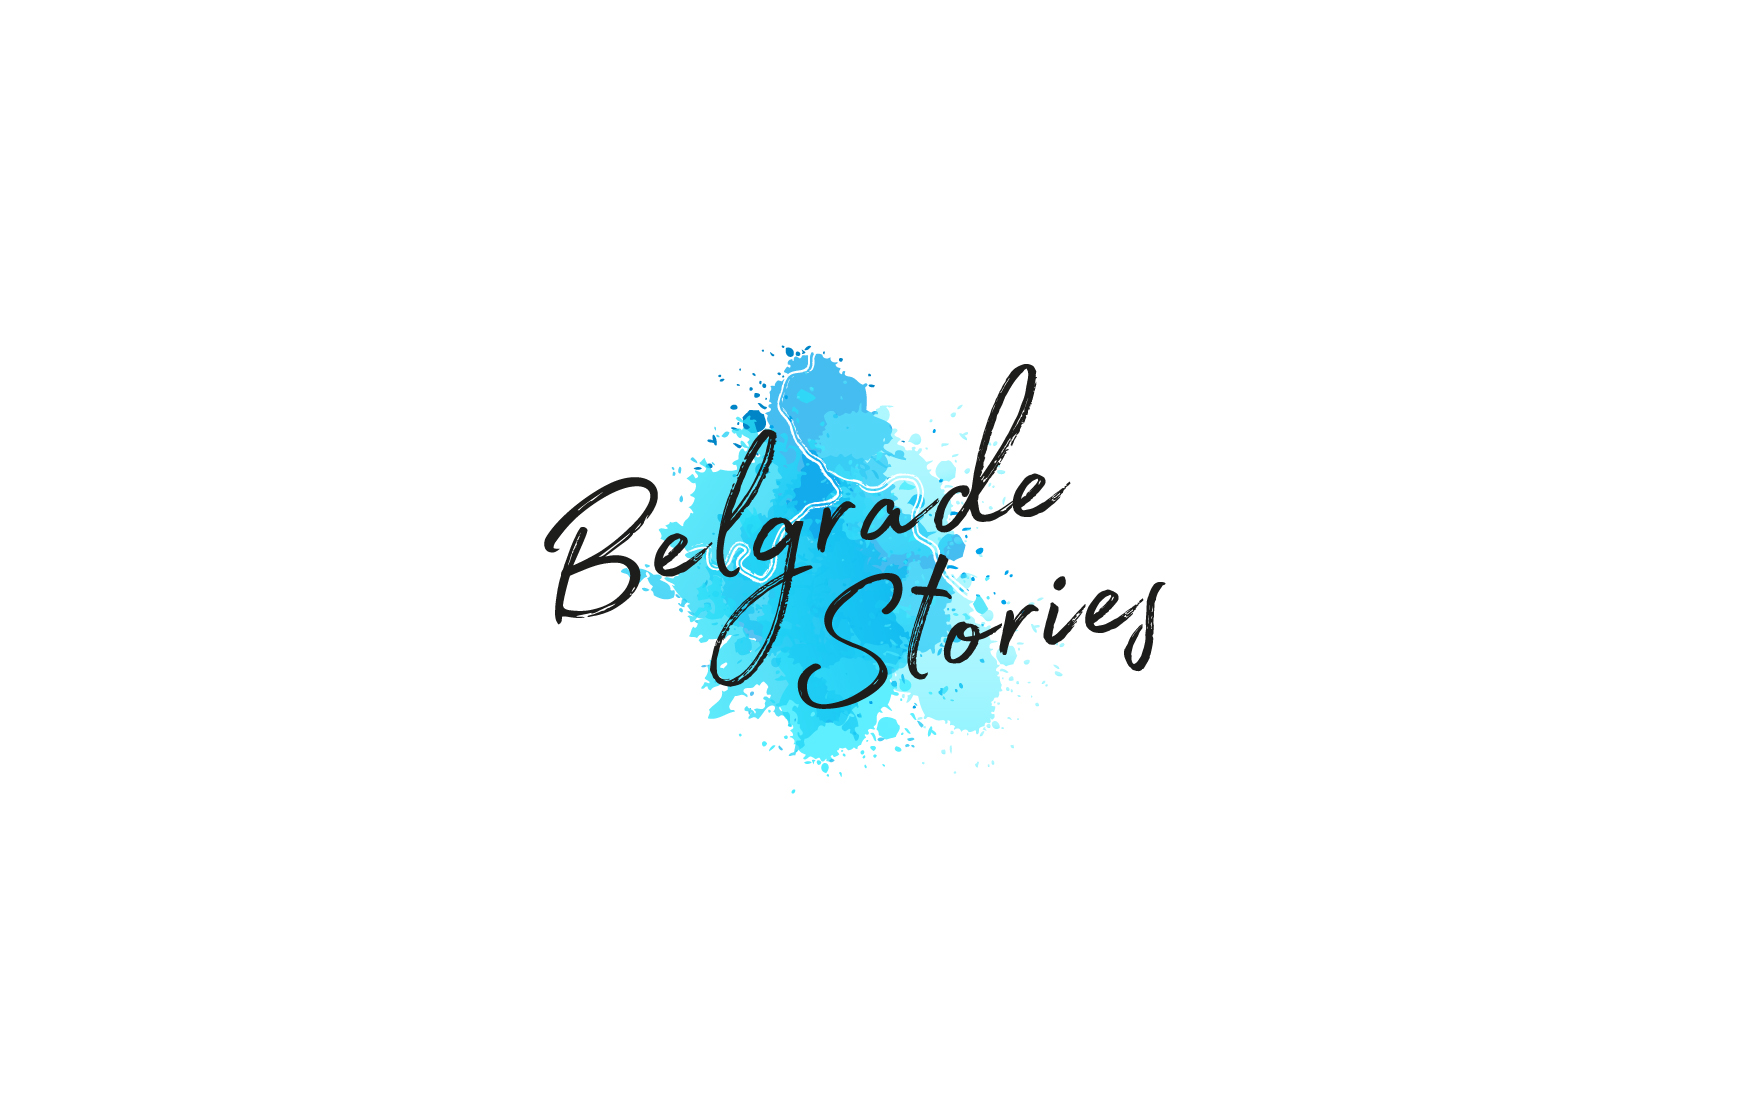 Логотип для агентства городских туров в Белграде фото f_91258929a807faaa.jpg